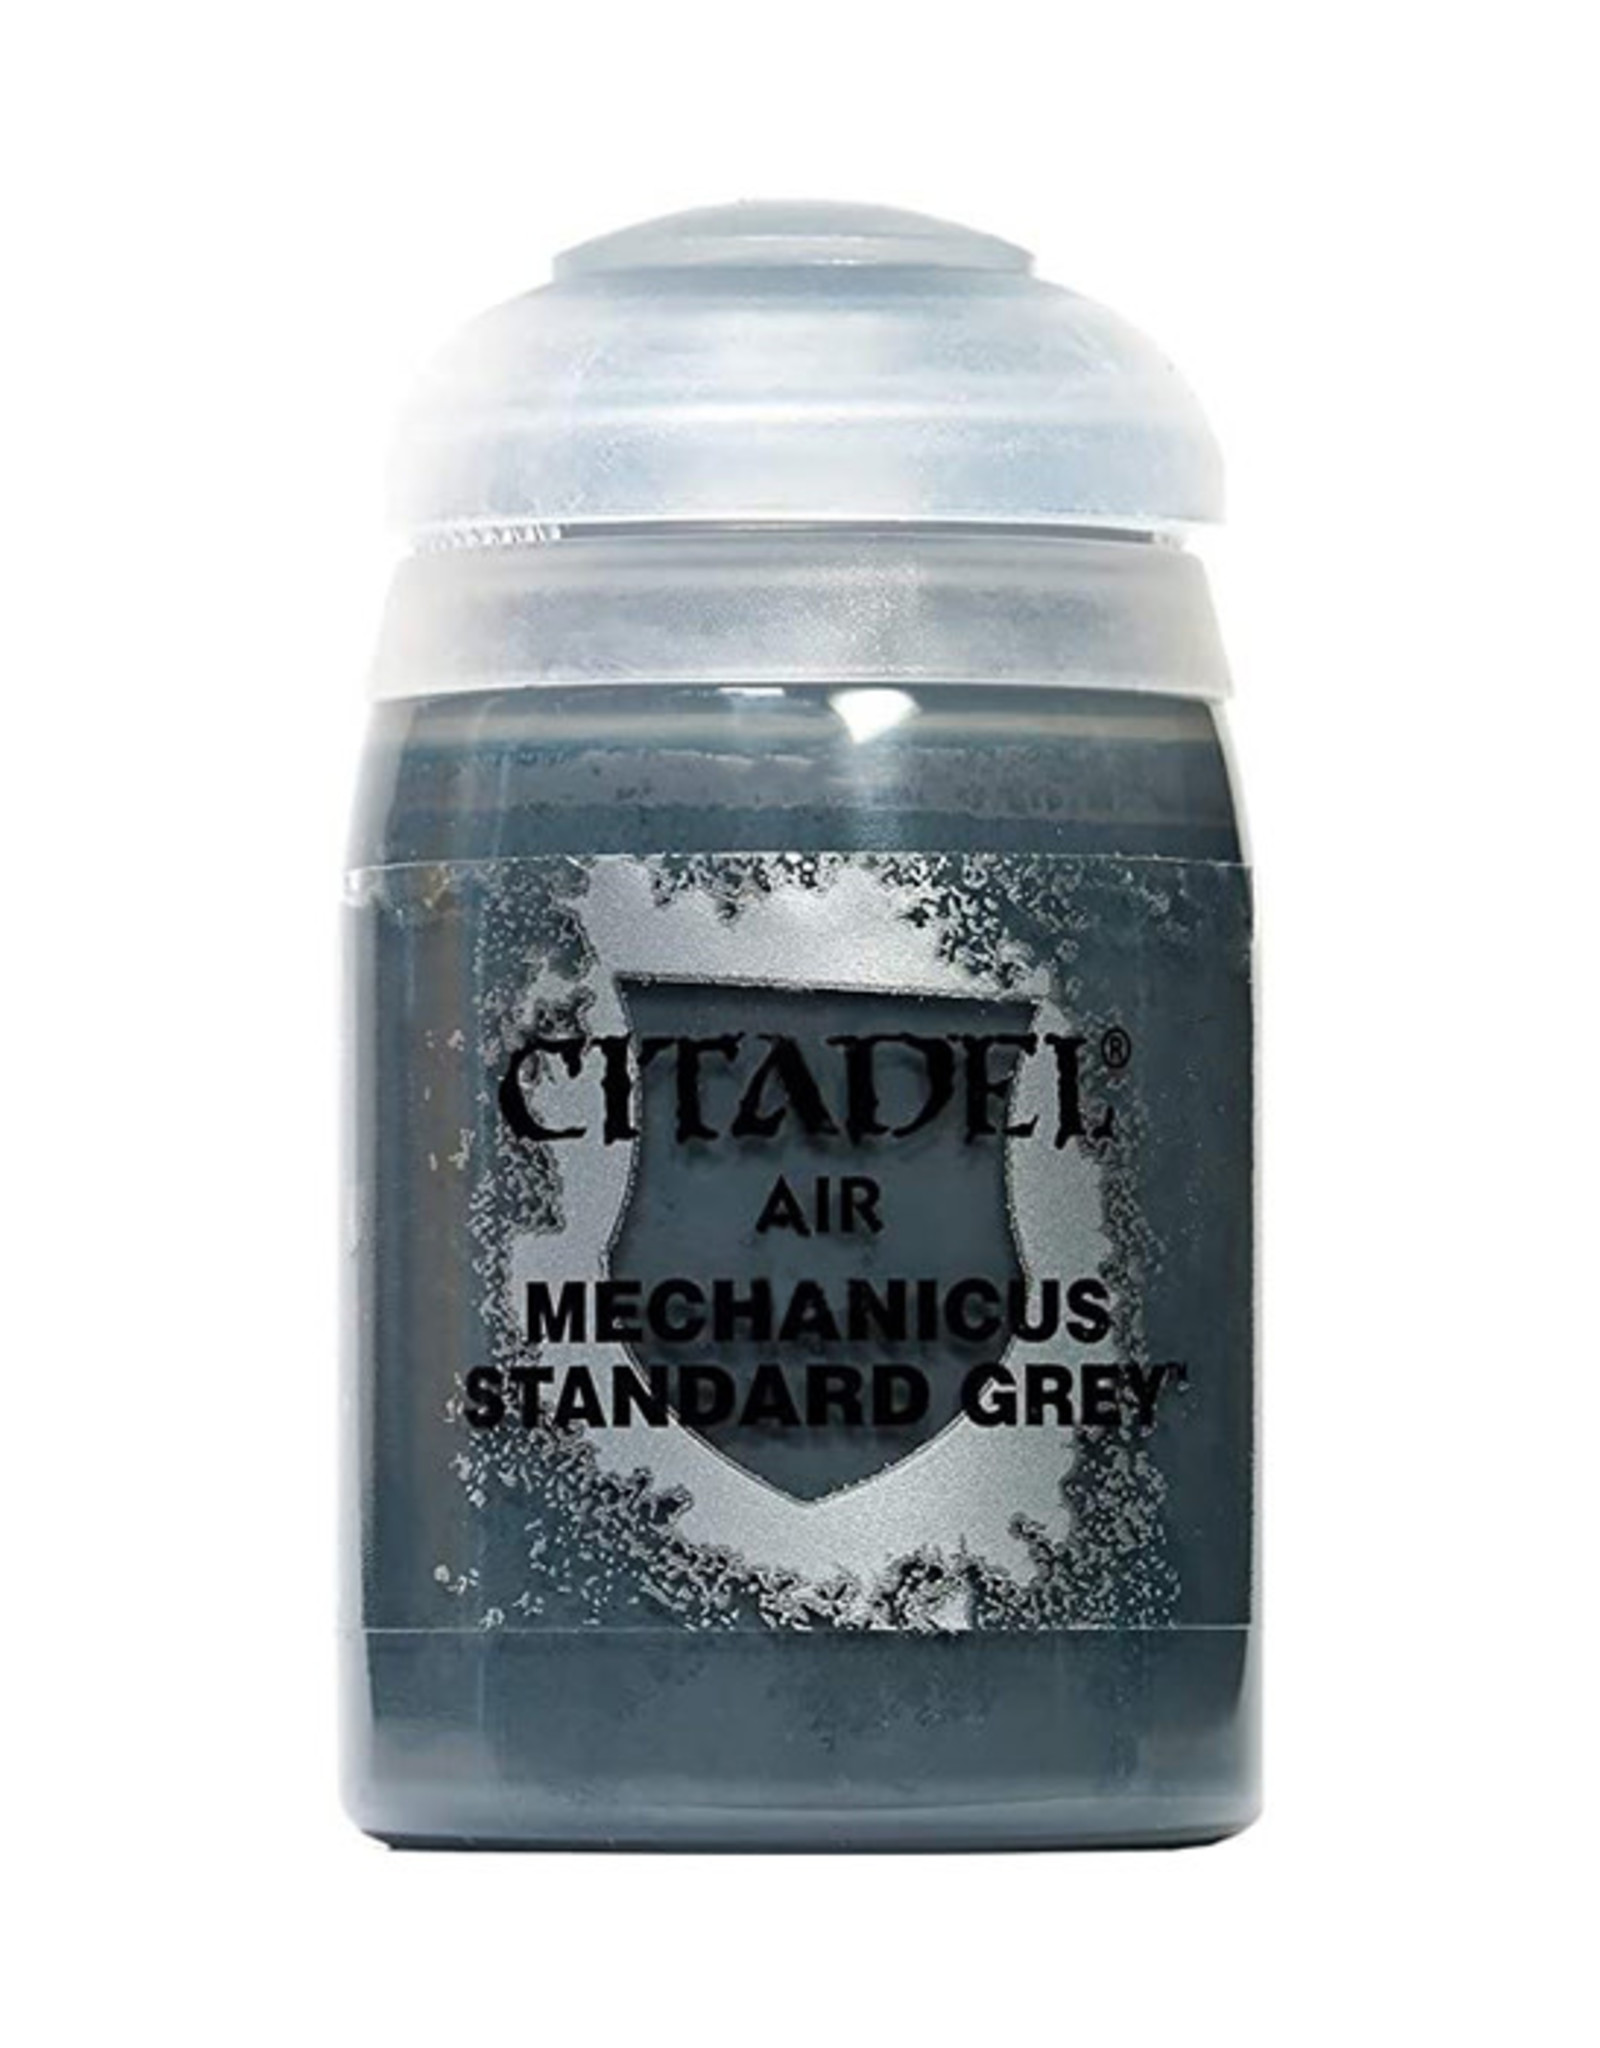 Citadel Citadel Colour: Air - Mechanicus Standard Grey (24ML)